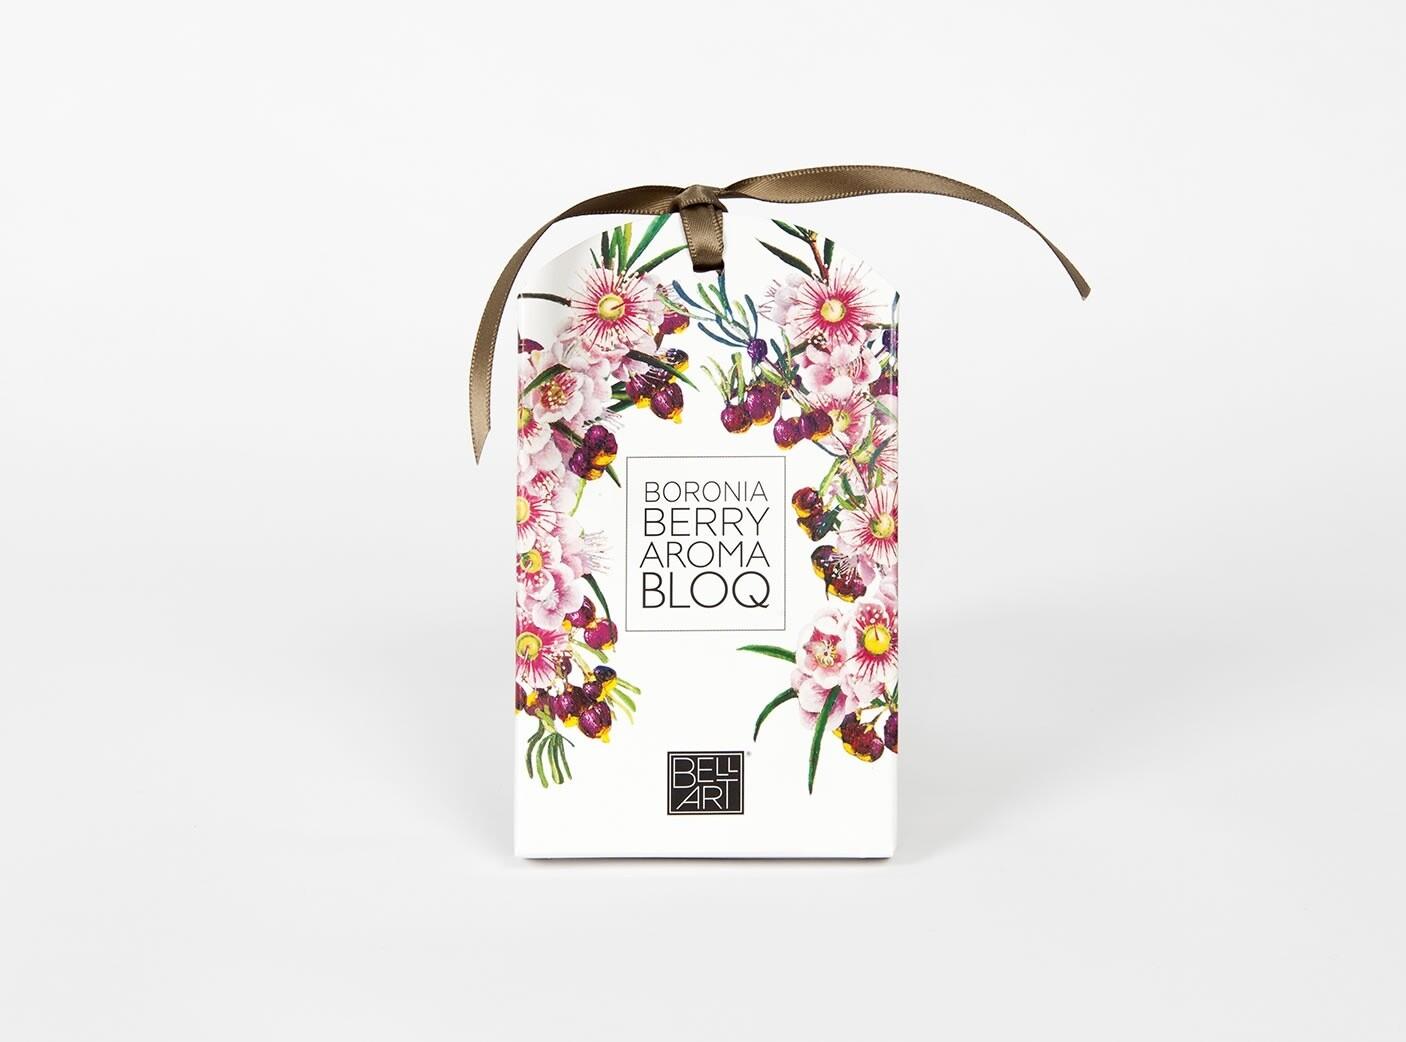 BELL ART - Aroma Bloq - Boronia Berry